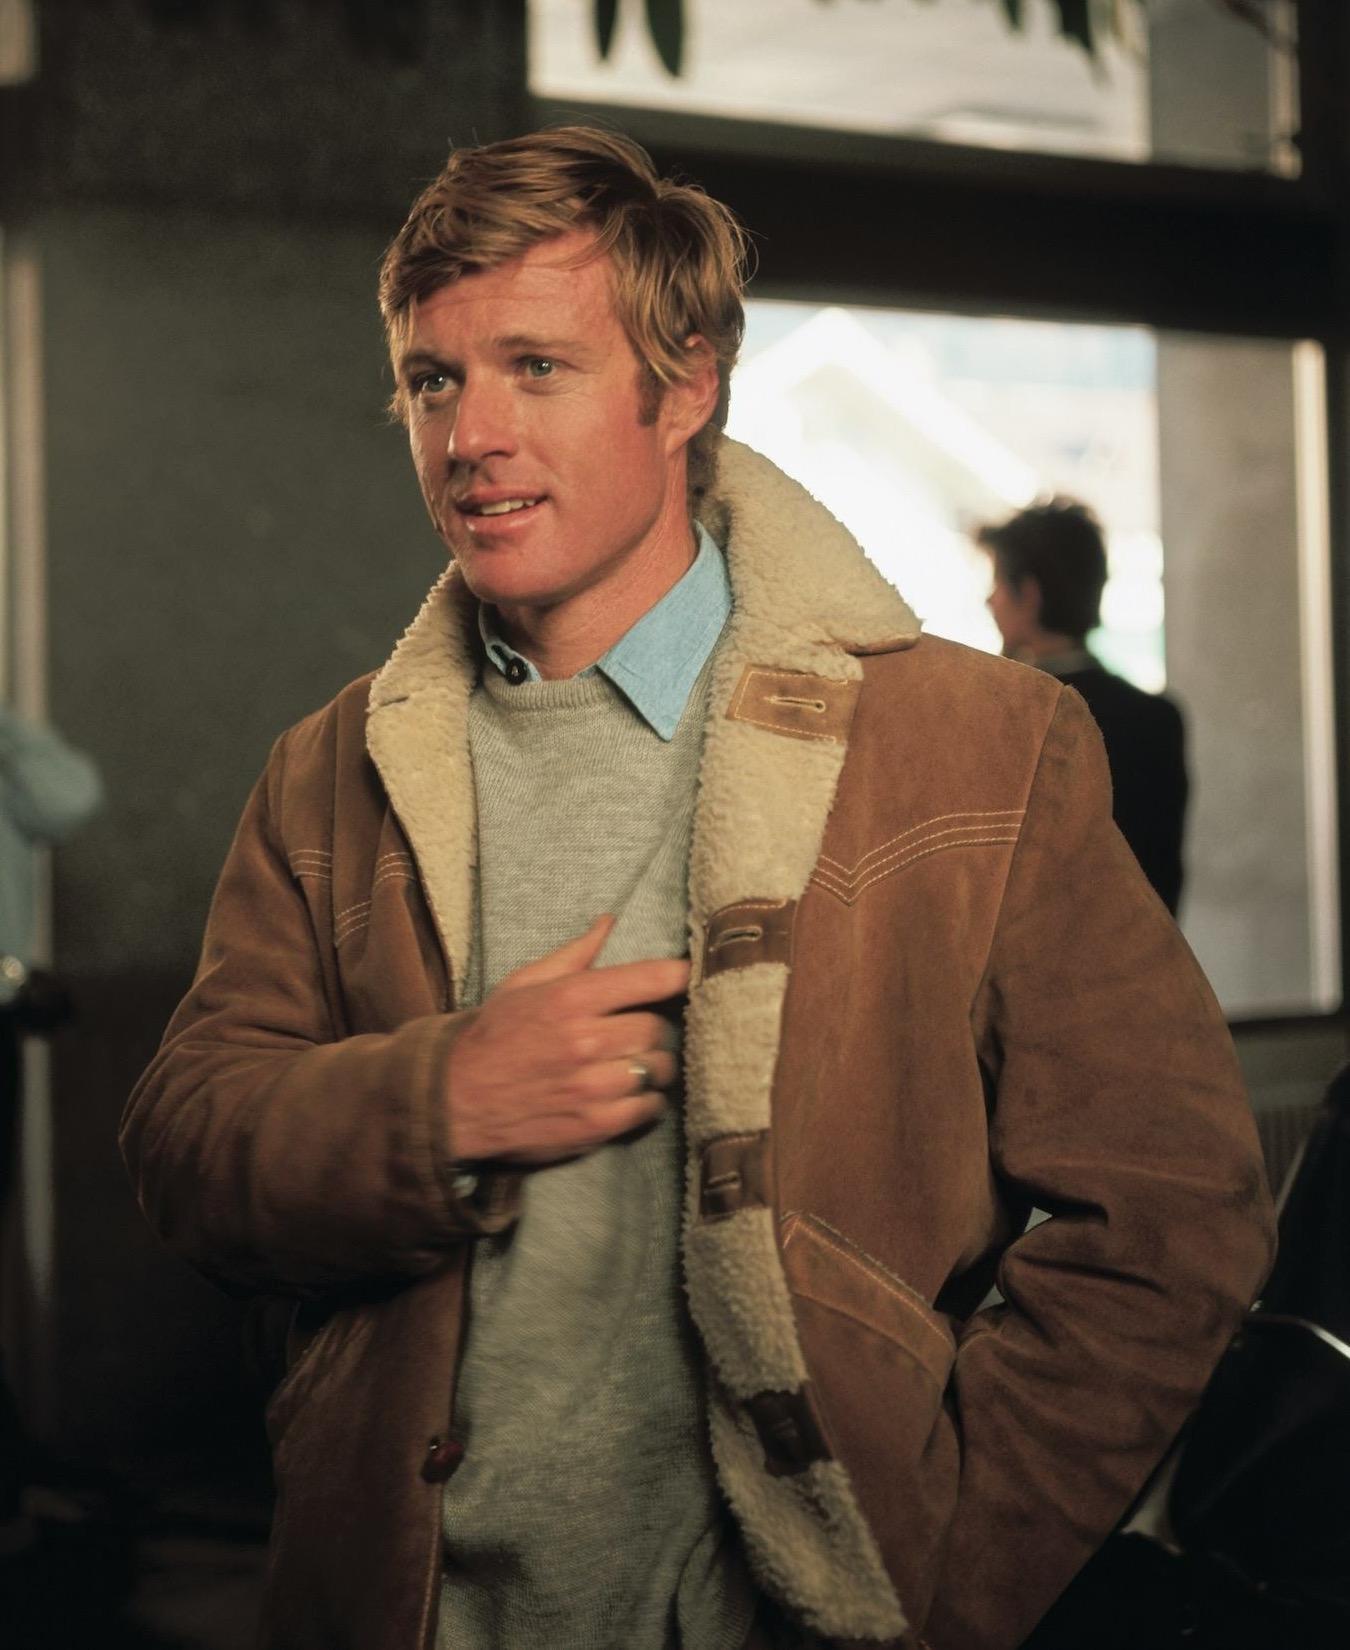 2075d9300db Robert Redford s Shearling Jacket in Downhill Racer. Robert Redford as  David Chappellet in Downhill Racer (1969)